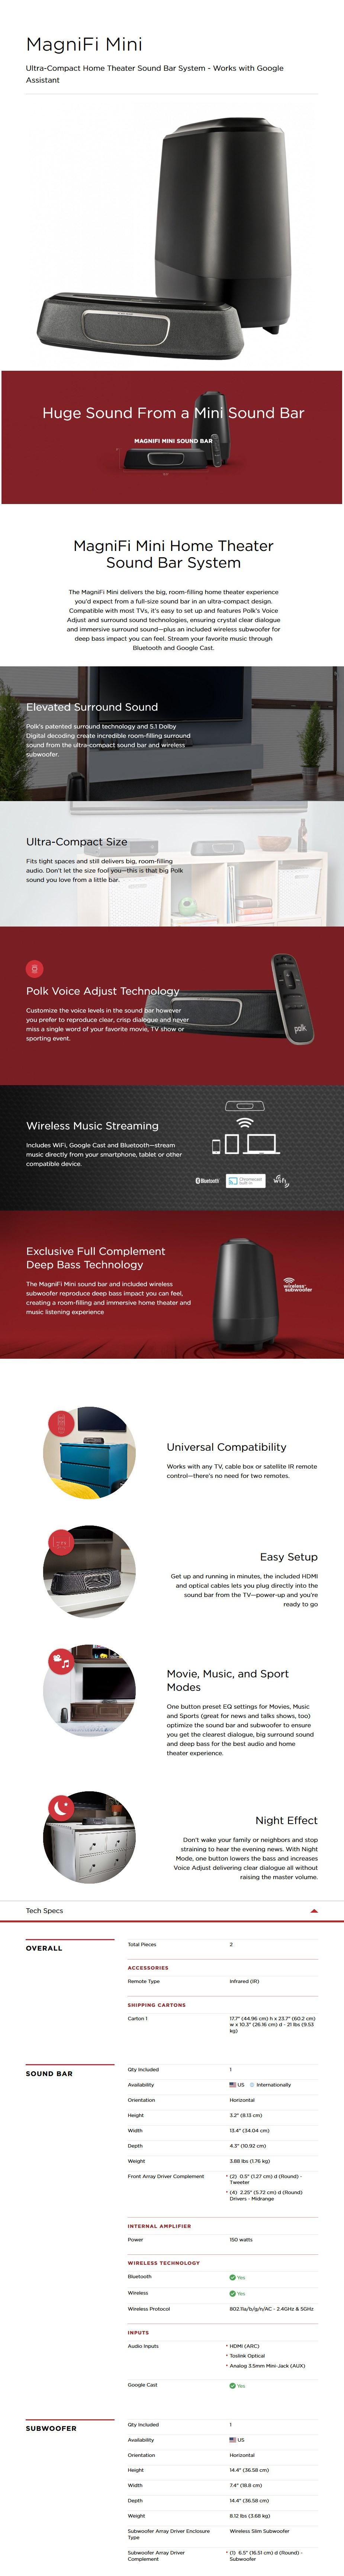 Polk MagniFi Mini Wireless Sound Bar System - Black - Desktop Overview 1